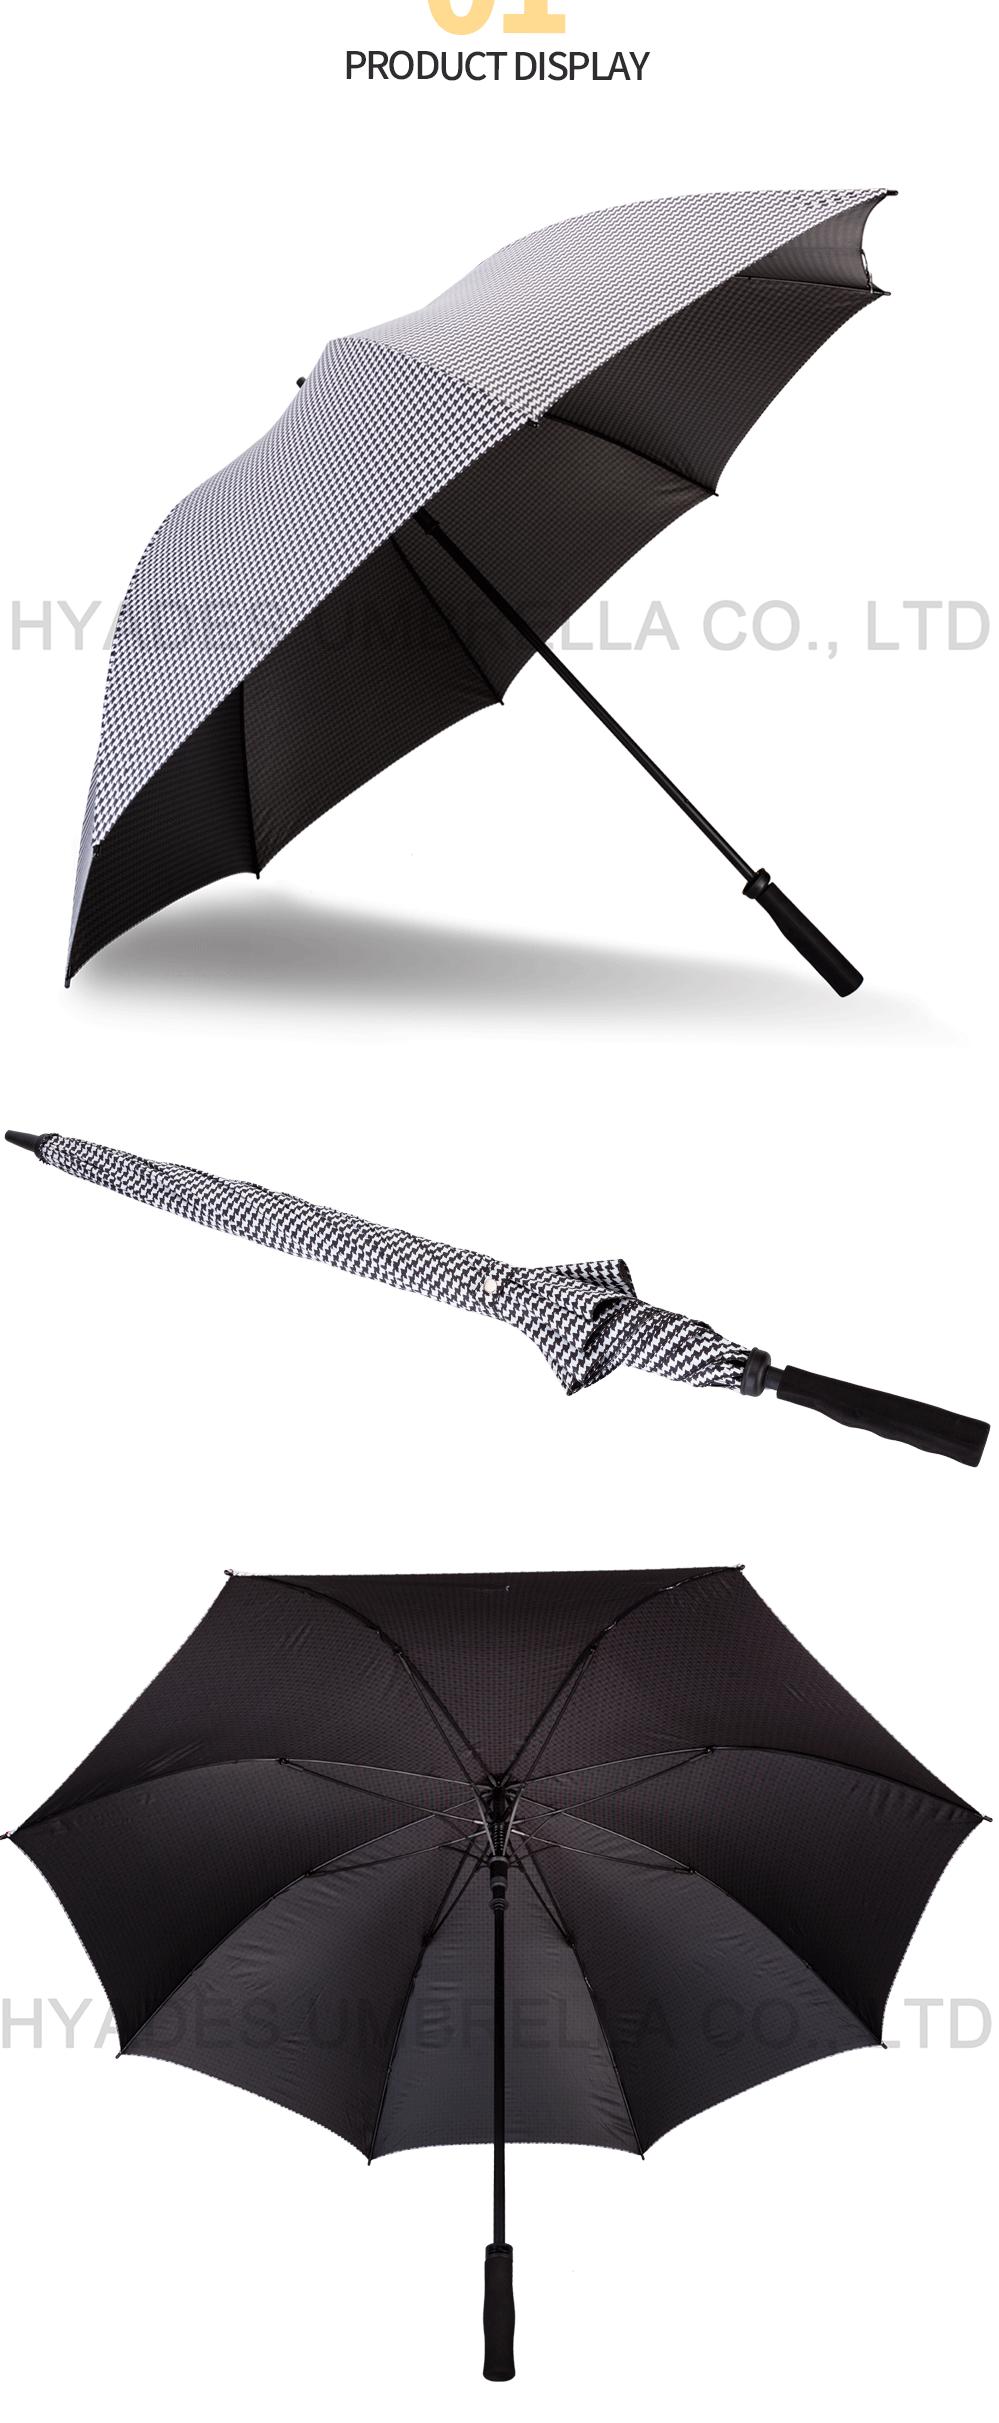 Product-Descrption-page---Ultra-Light-Golf-Umbrella_04